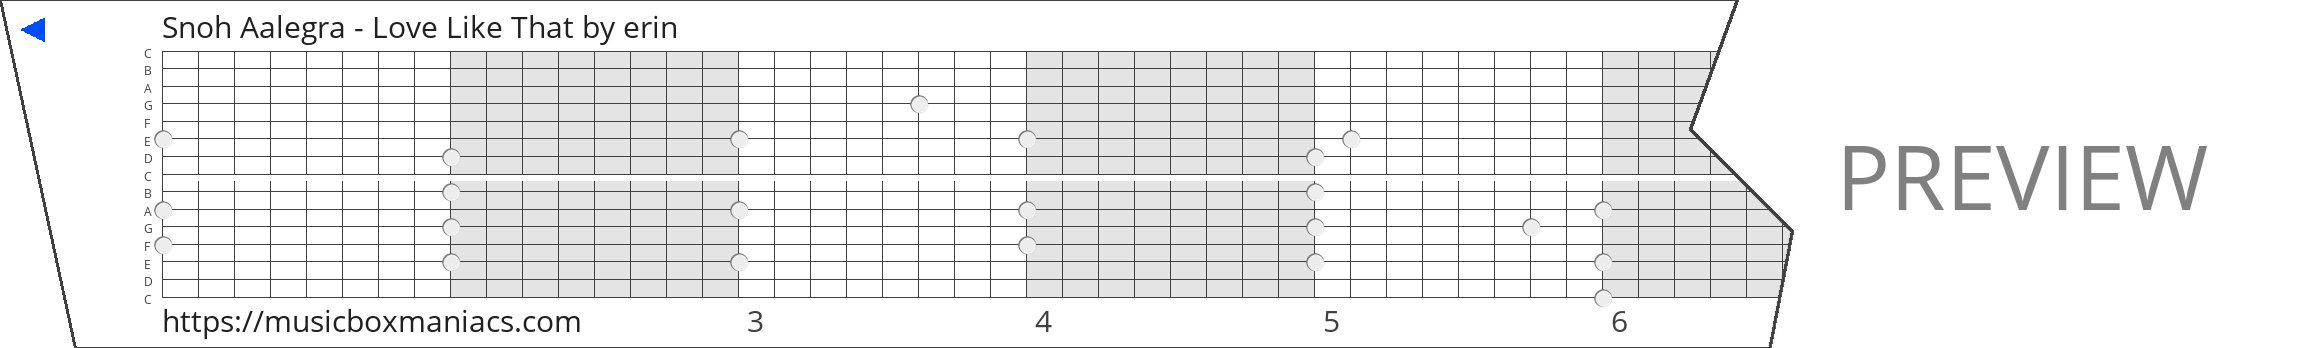 Snoh Aalegra - Love Like That 15 note music box paper strip